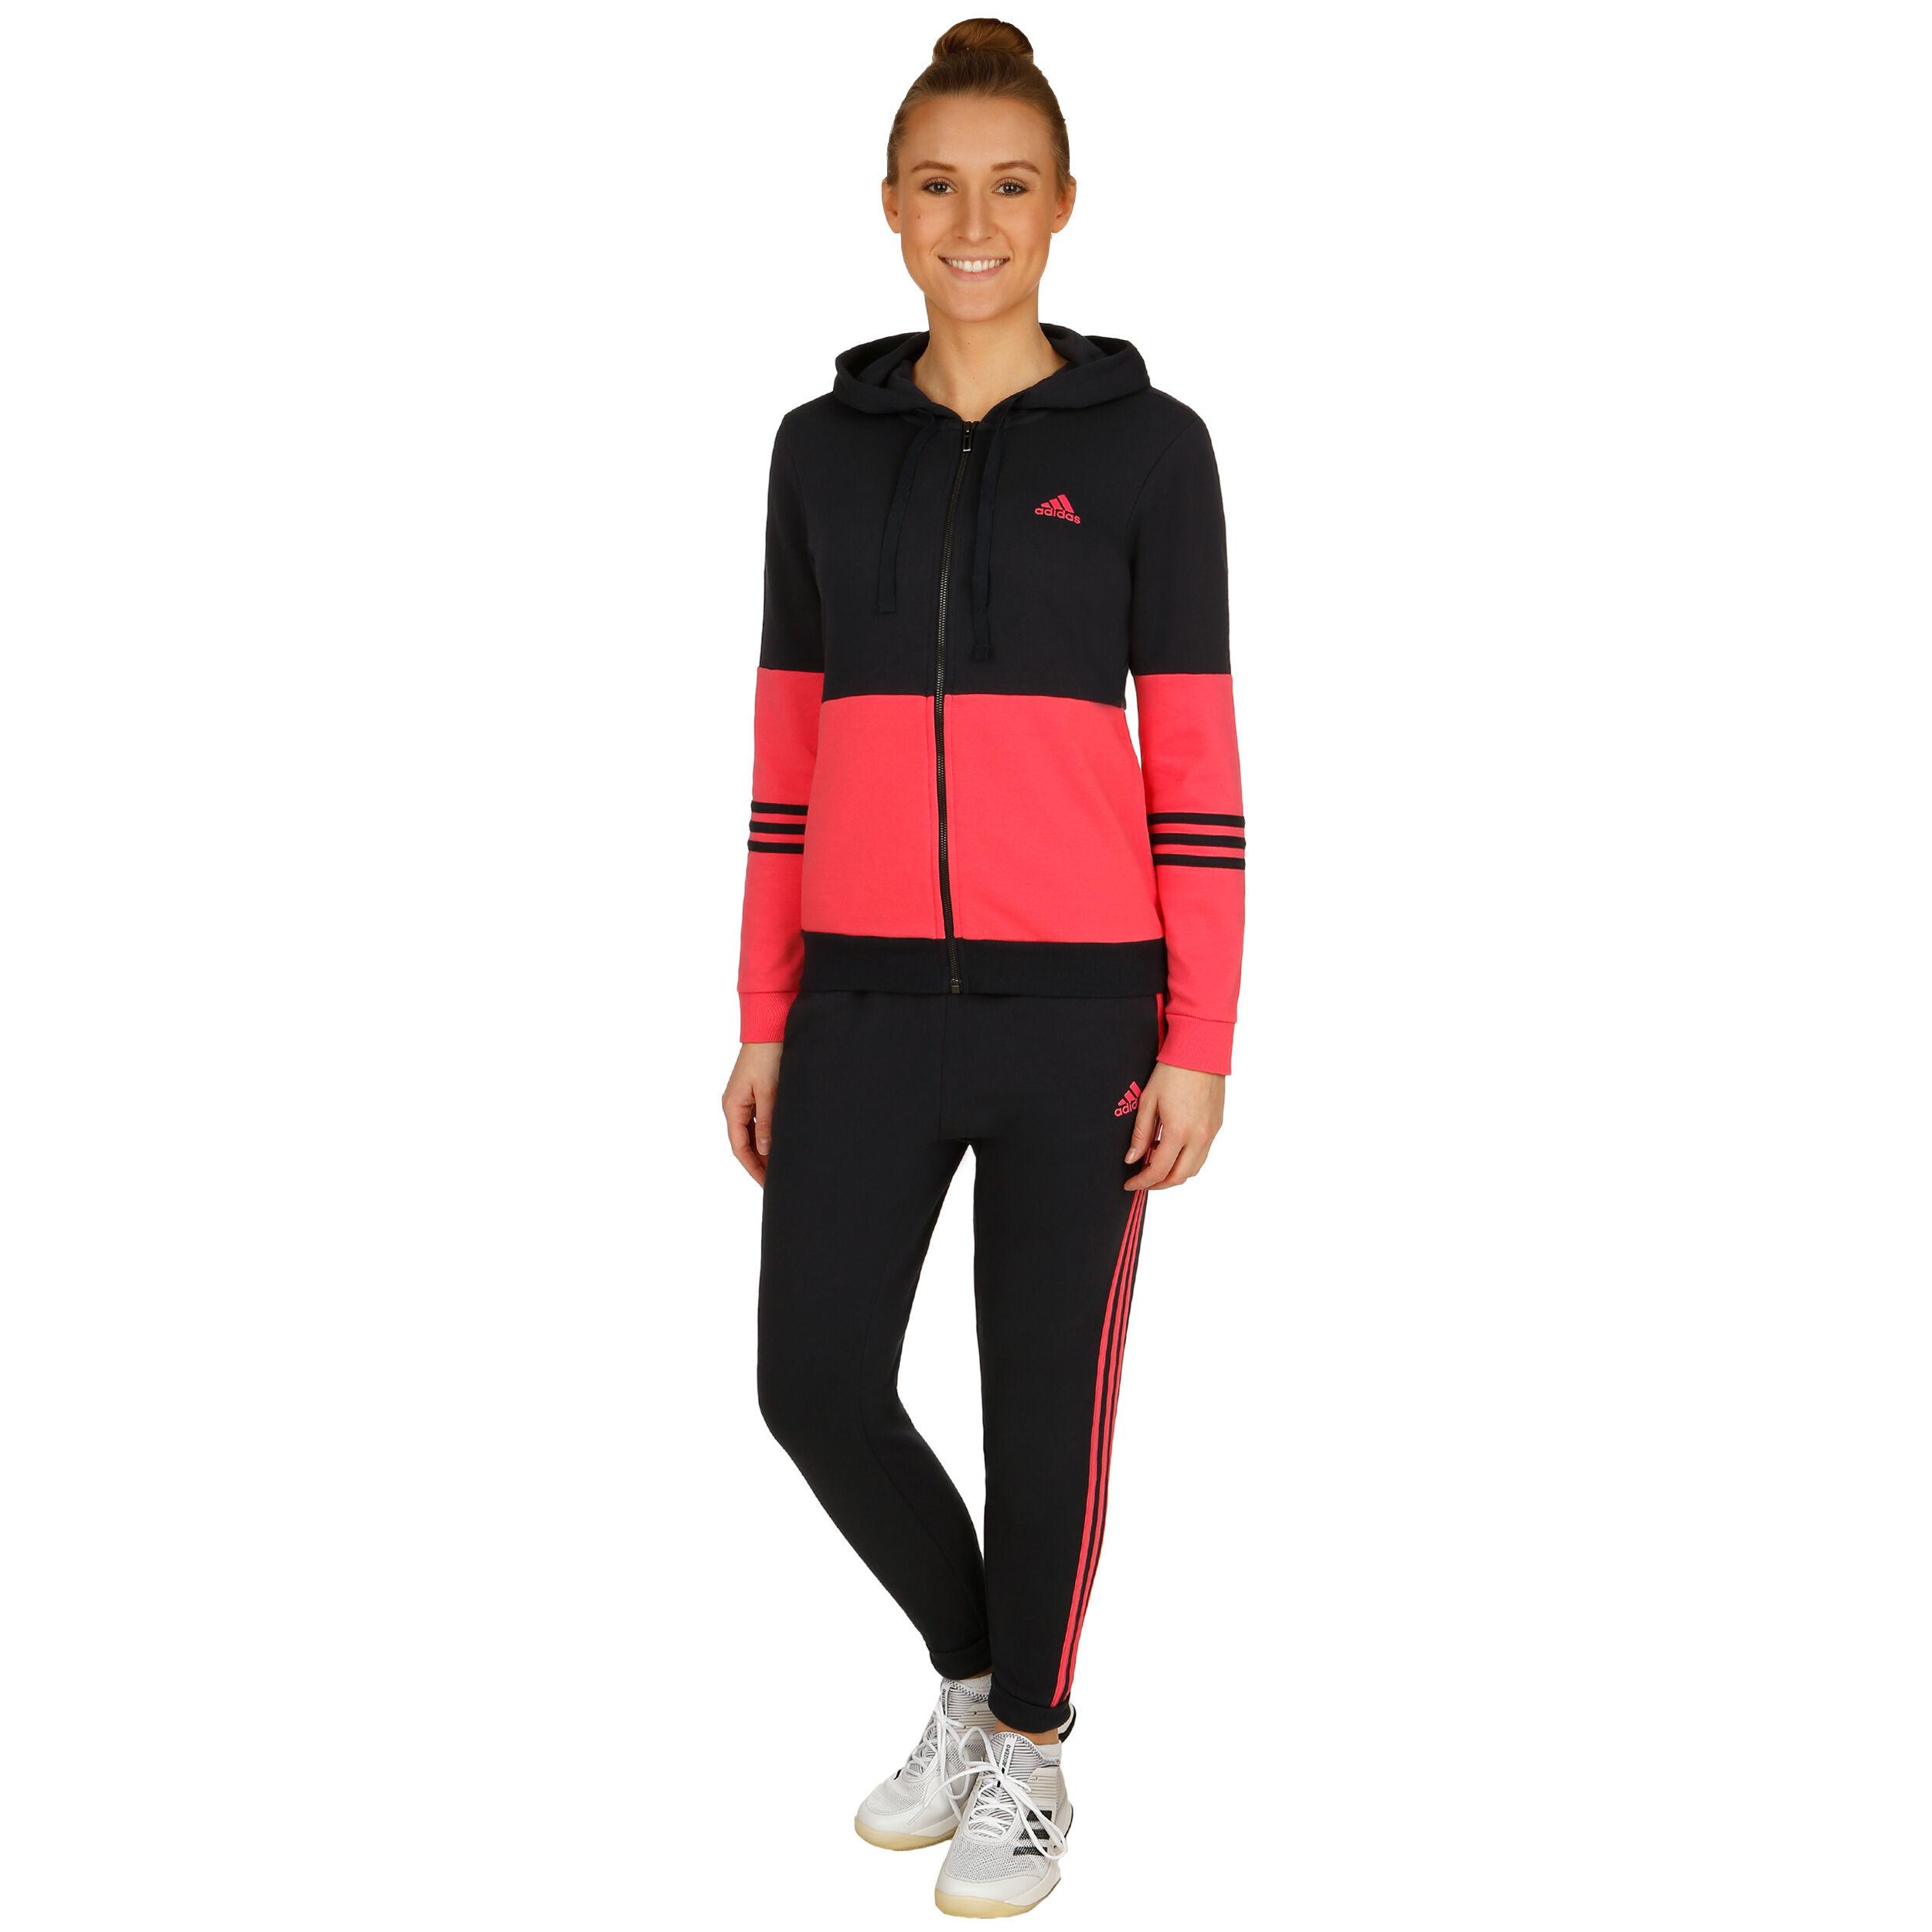 adidas Co Energize Trainingspak Dames Donkerblauw, Pink